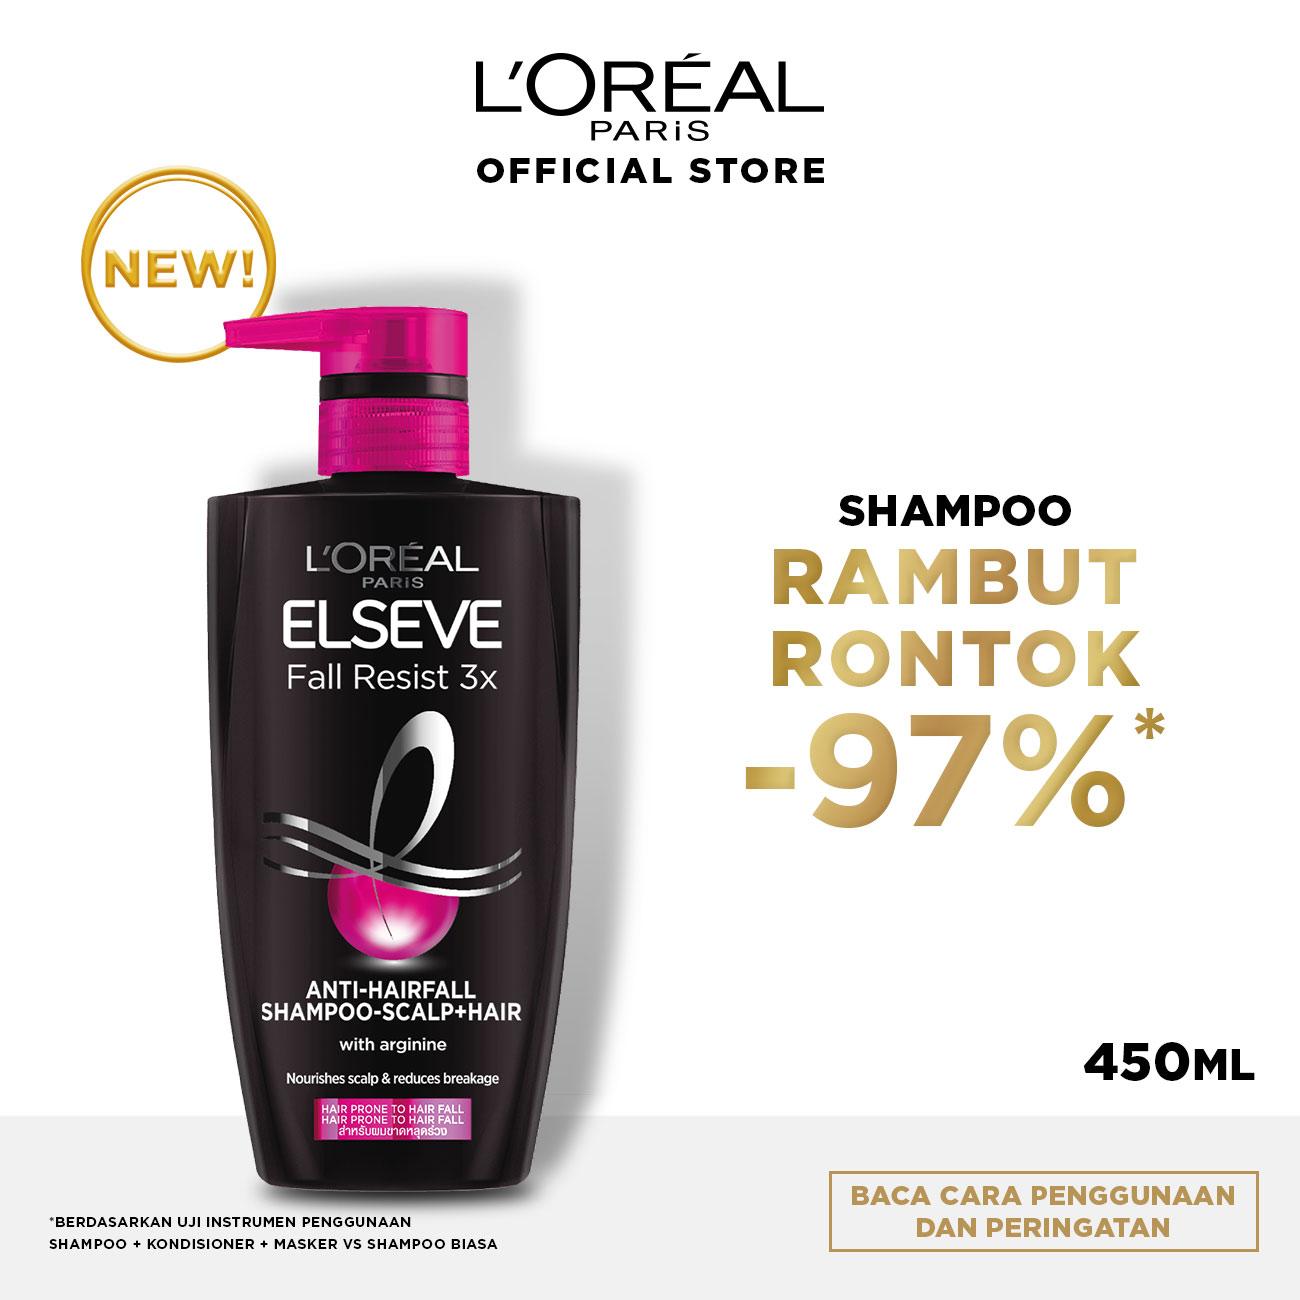 L'Oreal Paris Fall Resist 3x Shampoo Hair Care - 450 ml (Perawatan Untuk Rambut Mudah Rontok)